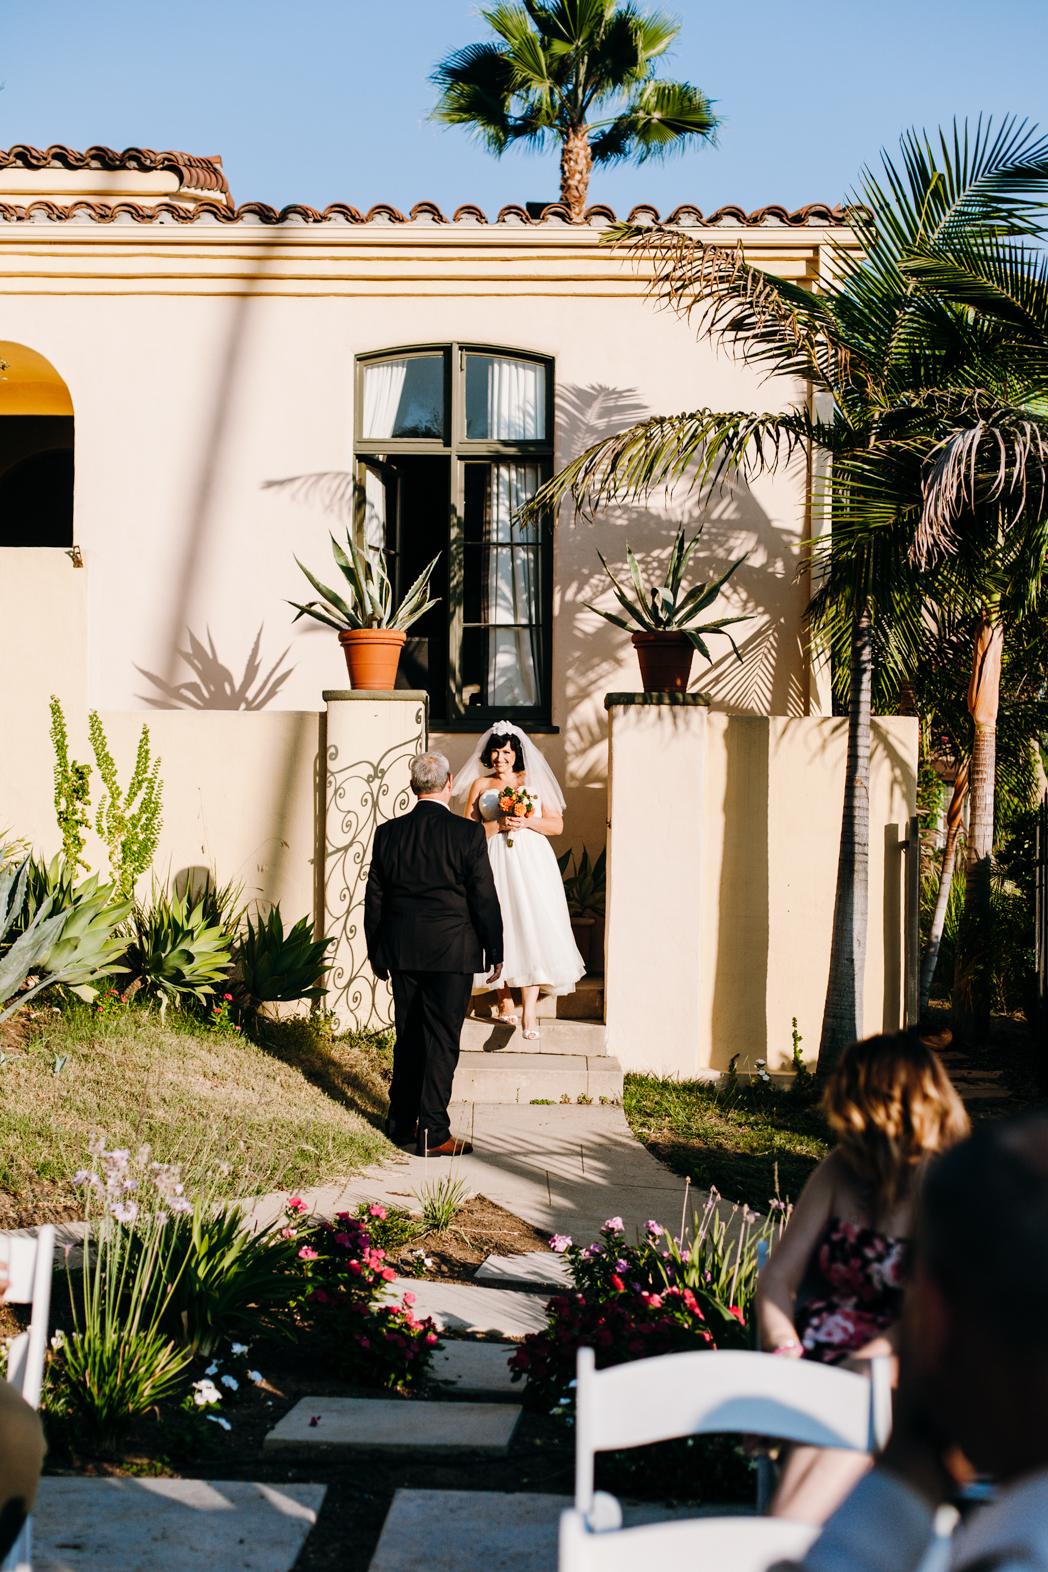 KaraNixonWeddings-LosAngeles-Wedding-9.jpg